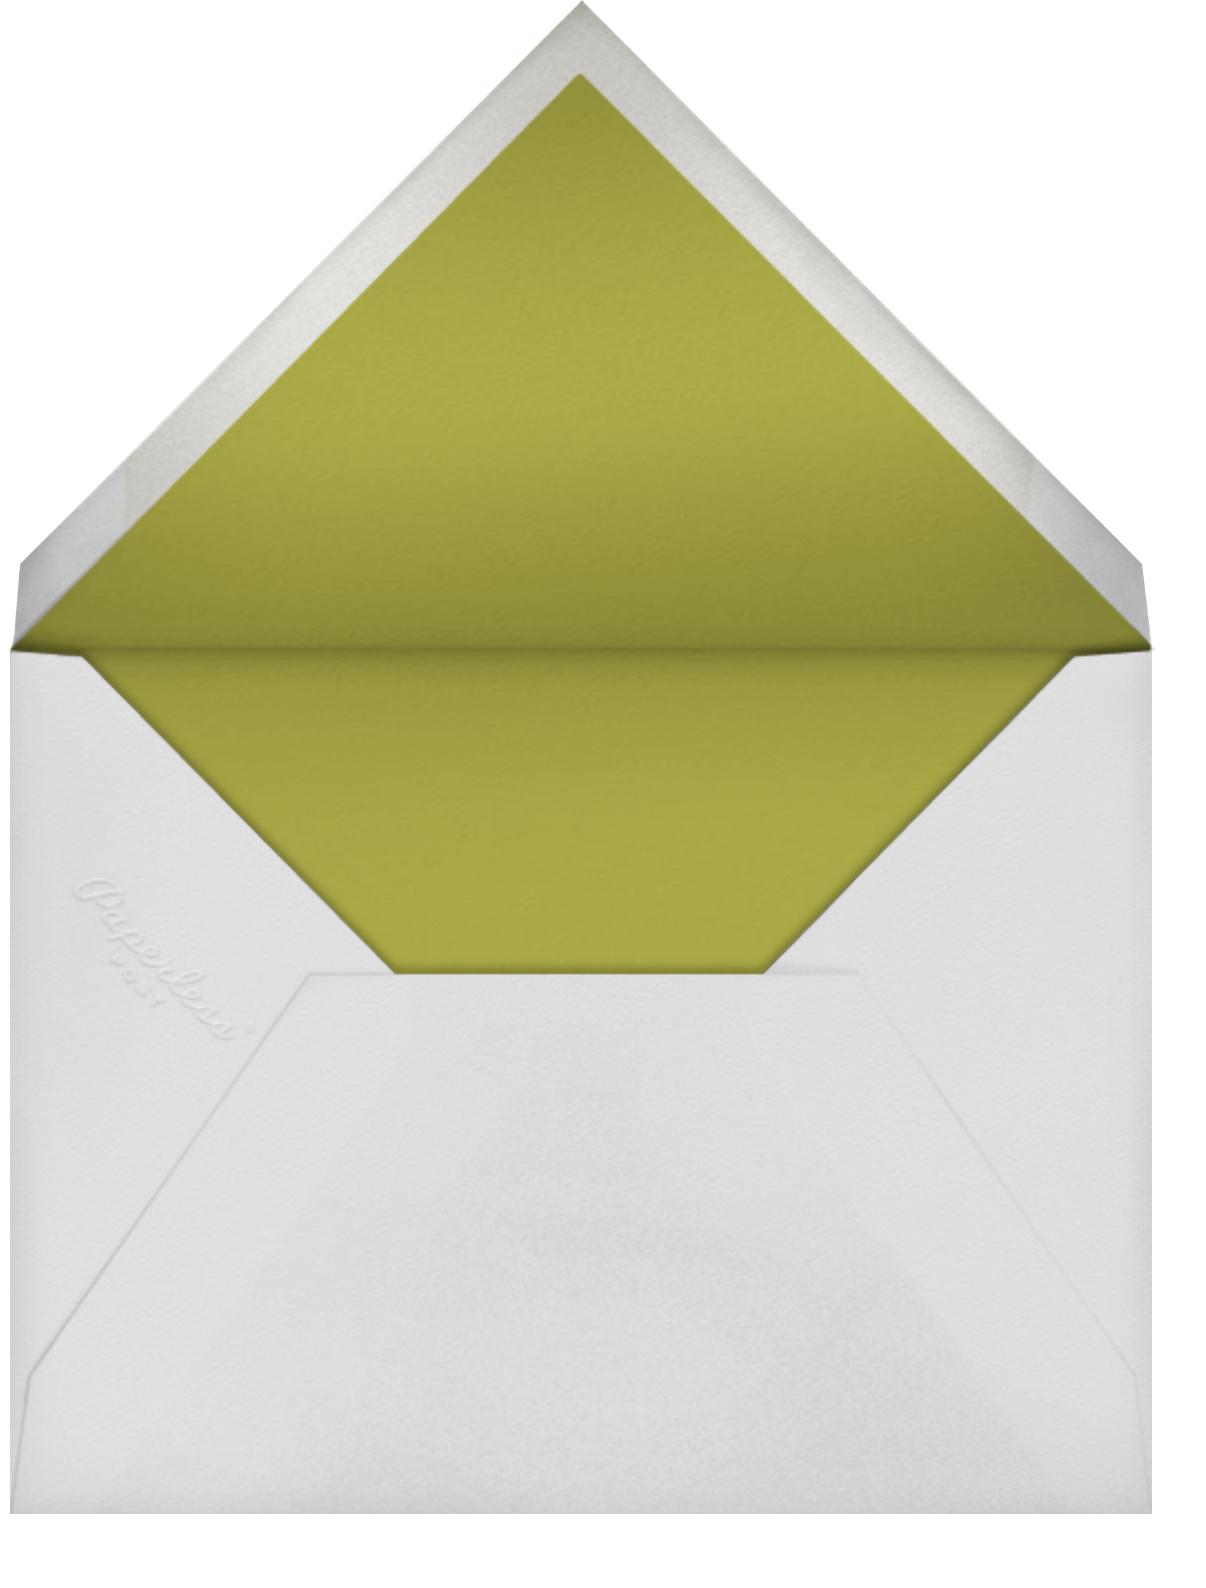 Let's Hang - White - Rifle Paper Co. - Kids' birthday - envelope back